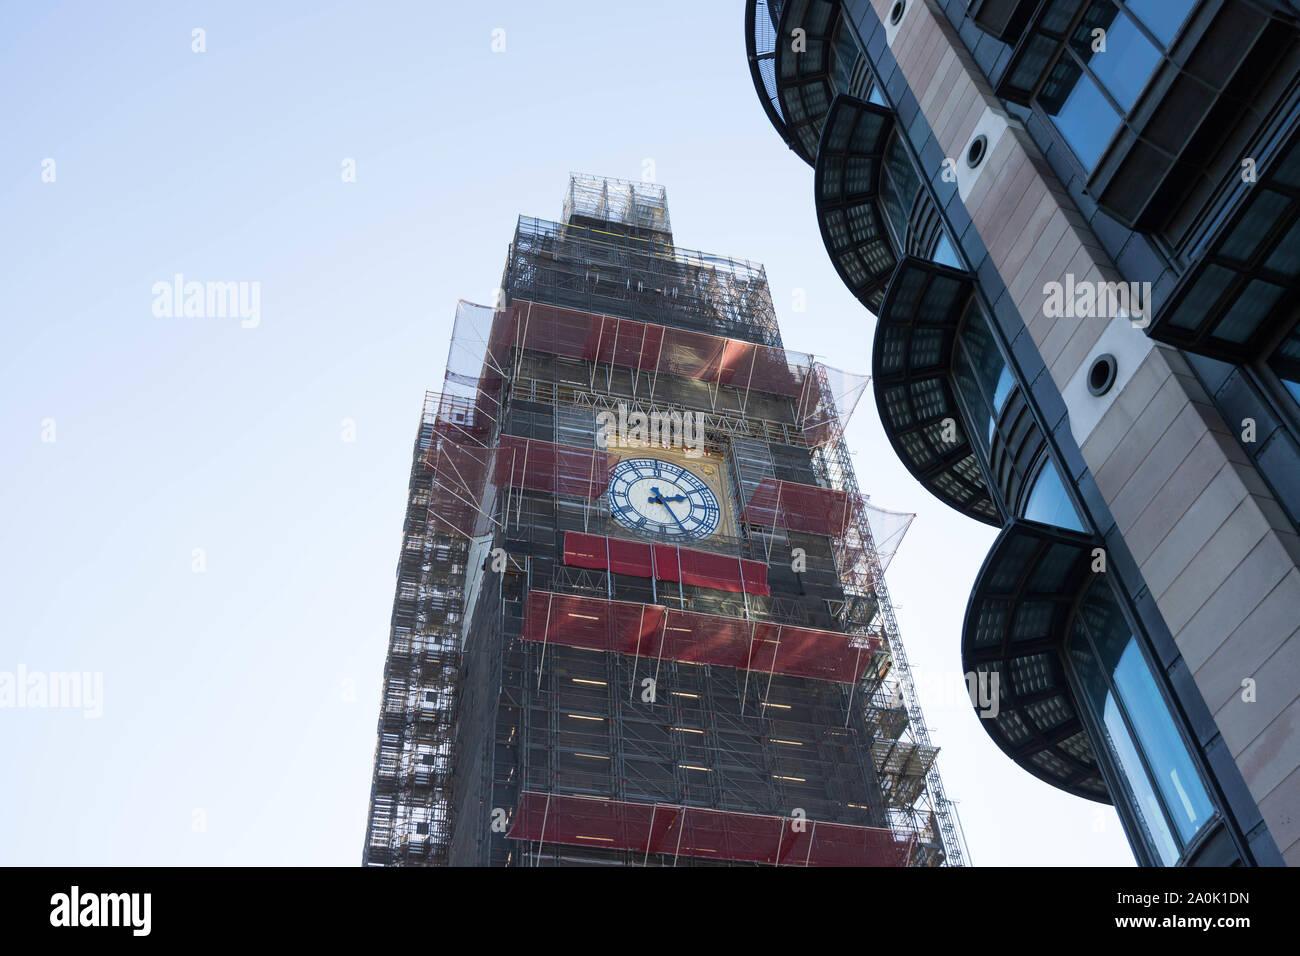 Big Ben  Clock tower  with scaffolding renovation work London united kingdom Stock Photo